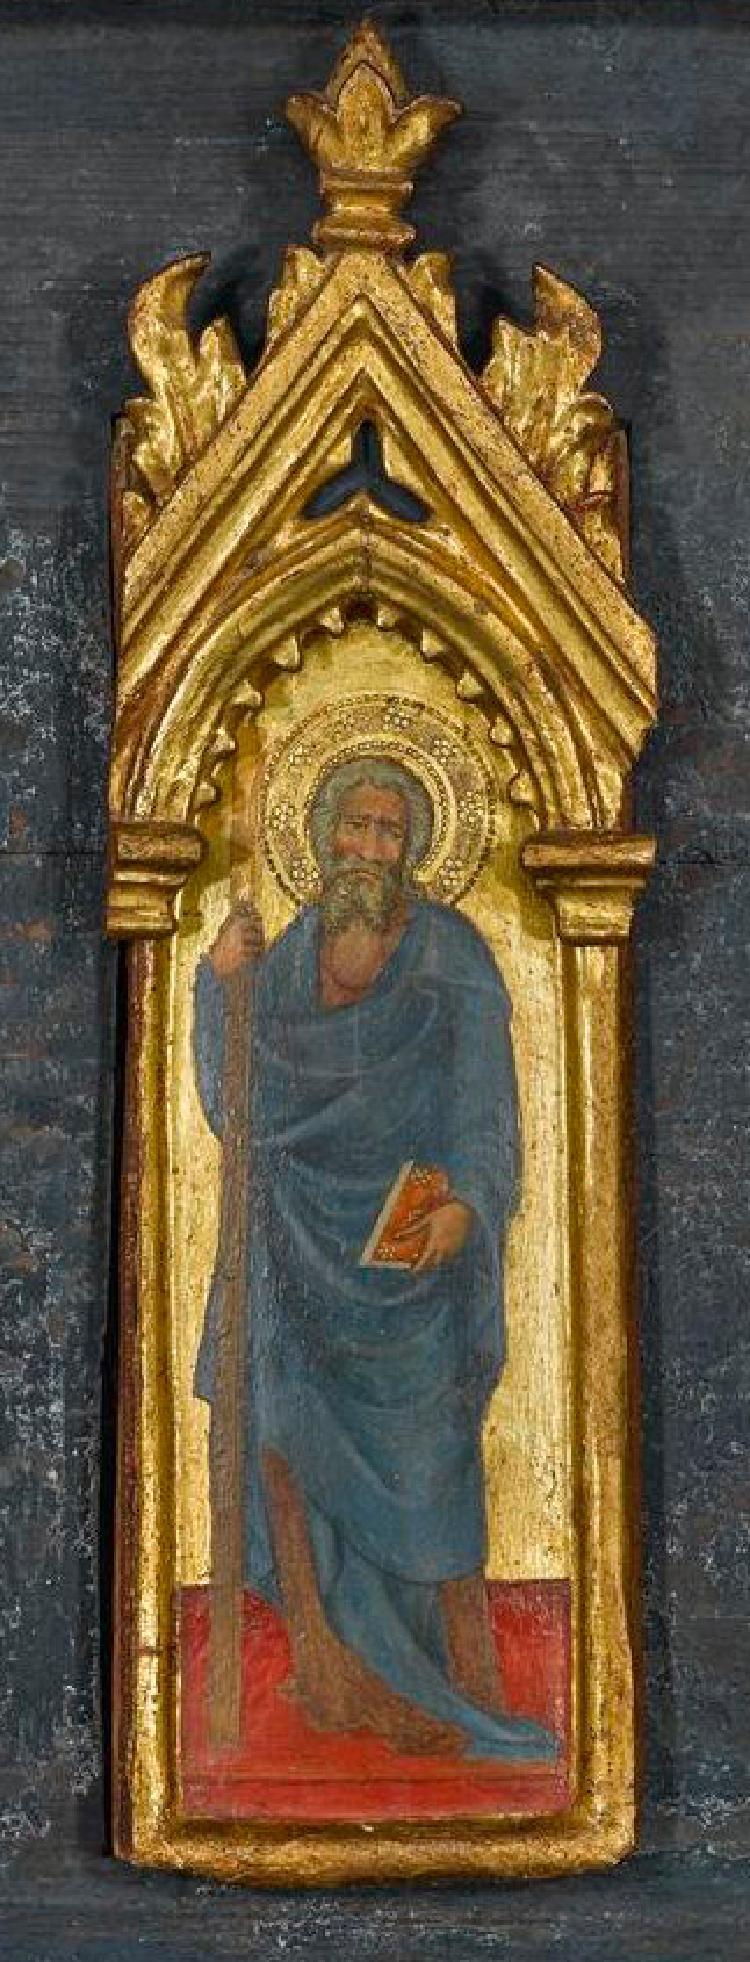 Der Apostel Bartholomäus (?)